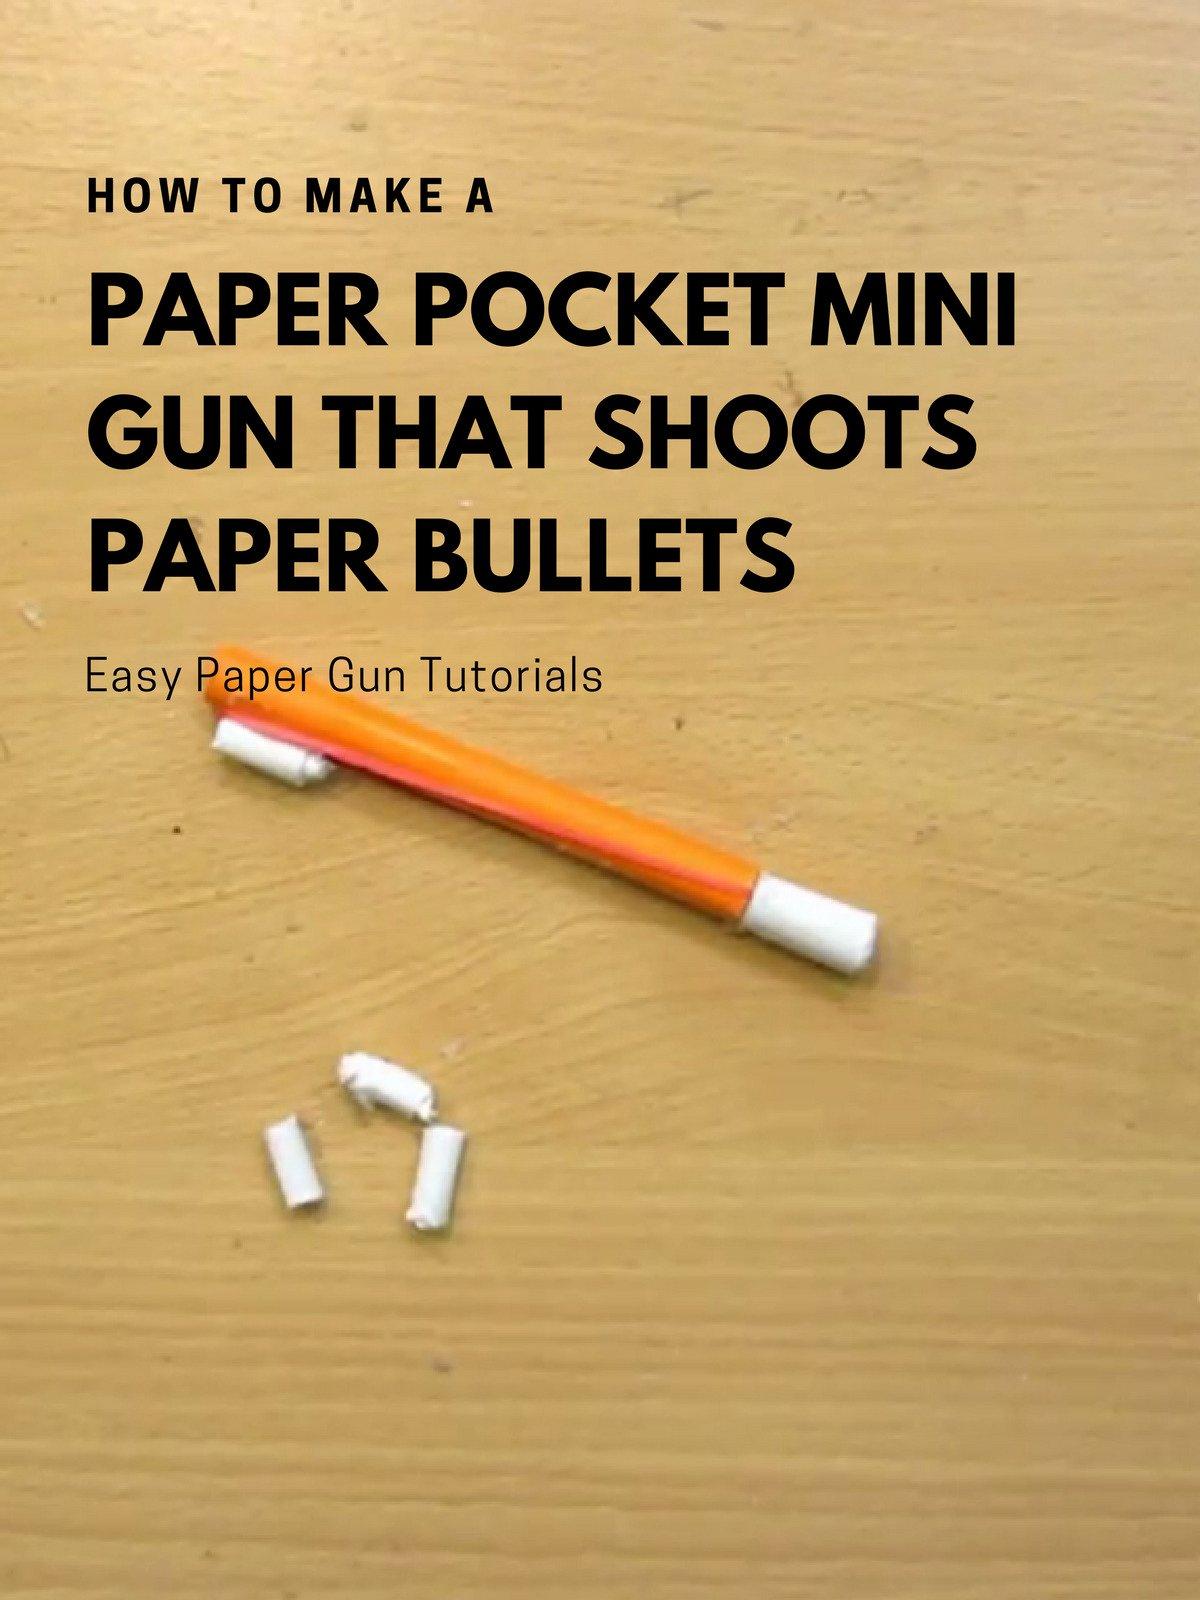 How To Make Mini Paper Guns That Shoot Paper Bullets (Easy Paper Gun) -  video dailymotion | 1600x1200